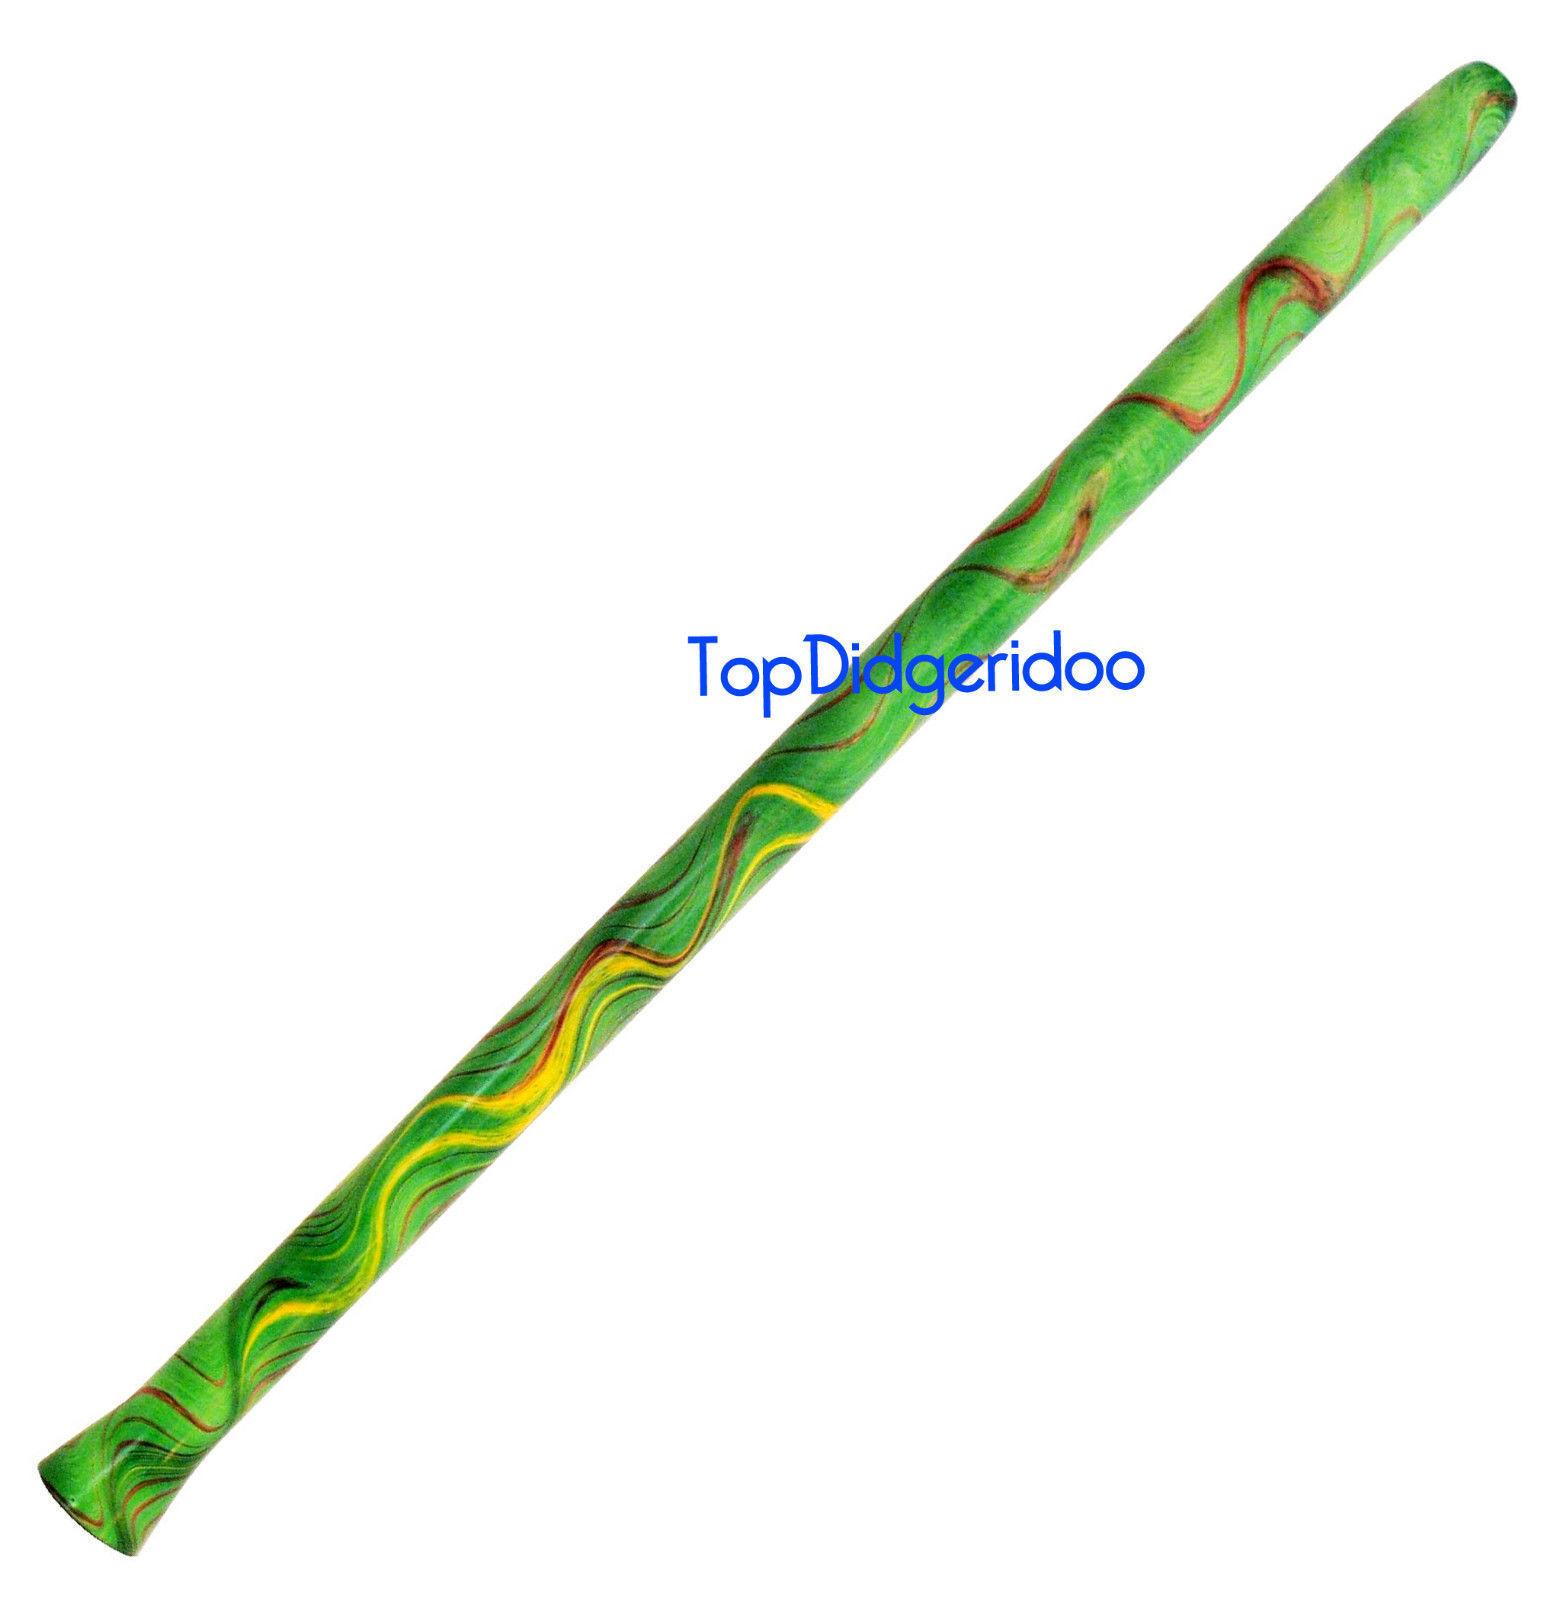 Laut Sound PVC Didgeridoo Schöne Modernes Design 130cm \ 130cm Lang